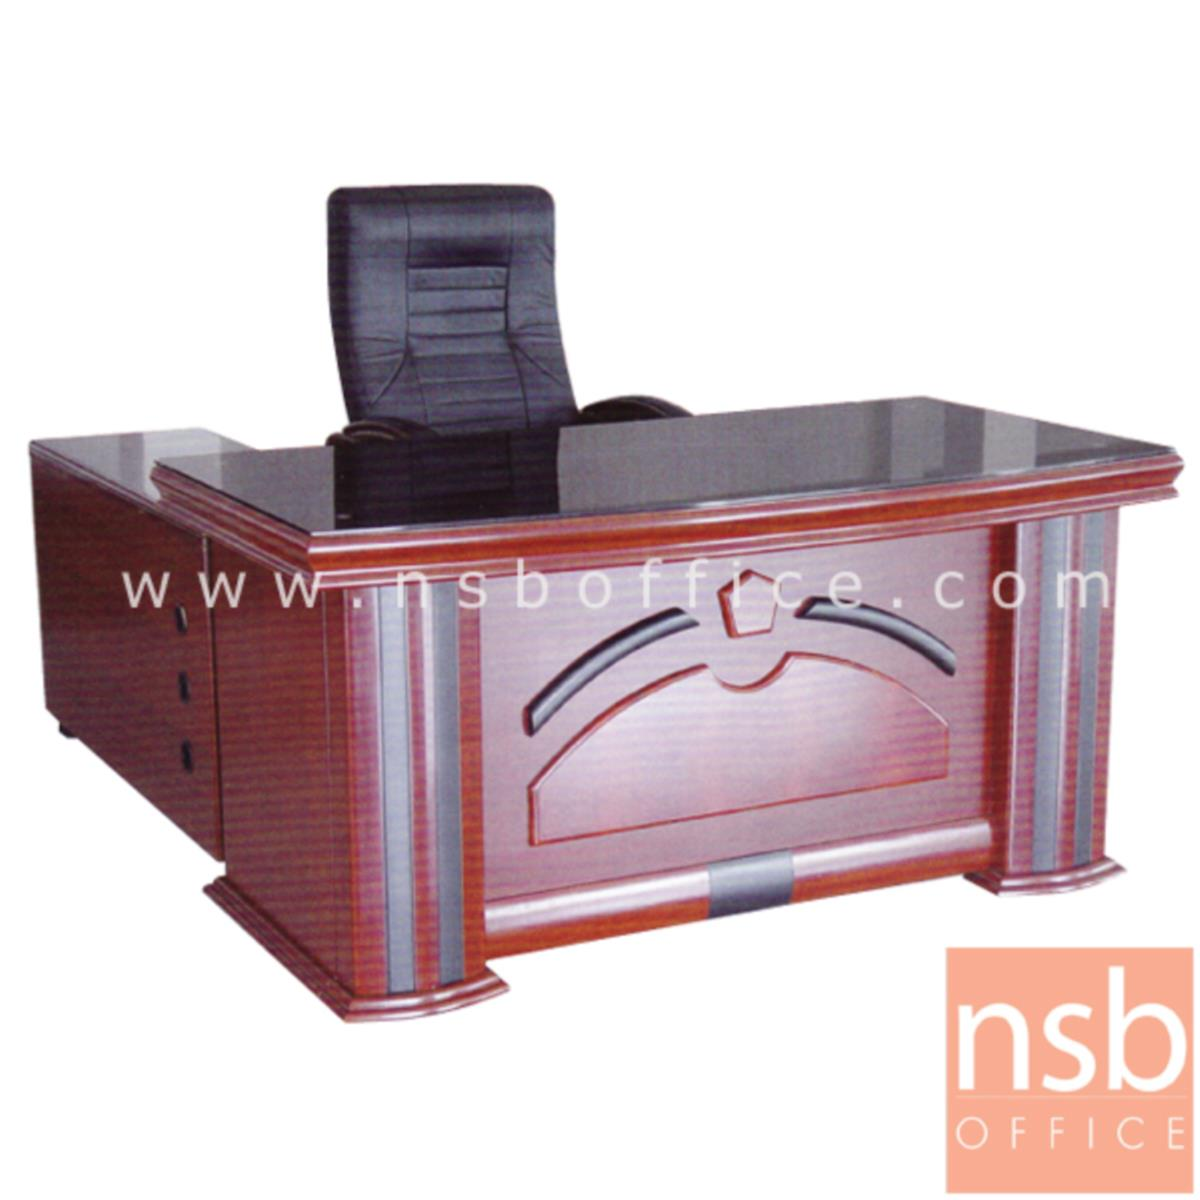 A06A064:โต๊ะผู้บริหารตัวแอล  รุ่น Sinatra (ซินาตรา) ขนาด 160W cm. พร้อมตู้ลิ้นชักและตู้ข้าง